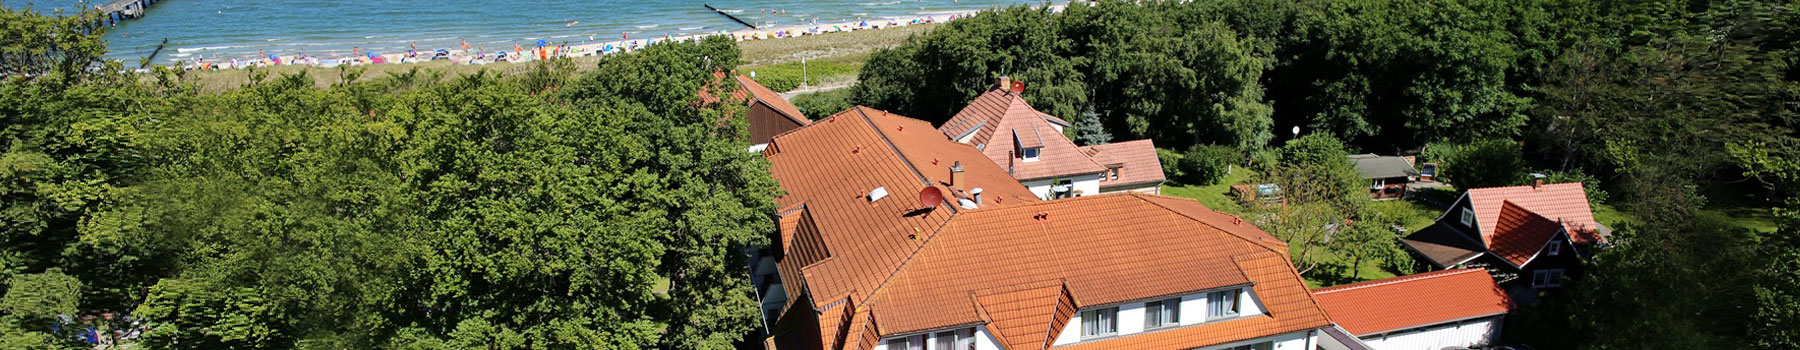 Hotel schmal - Hotel Haus am Meer